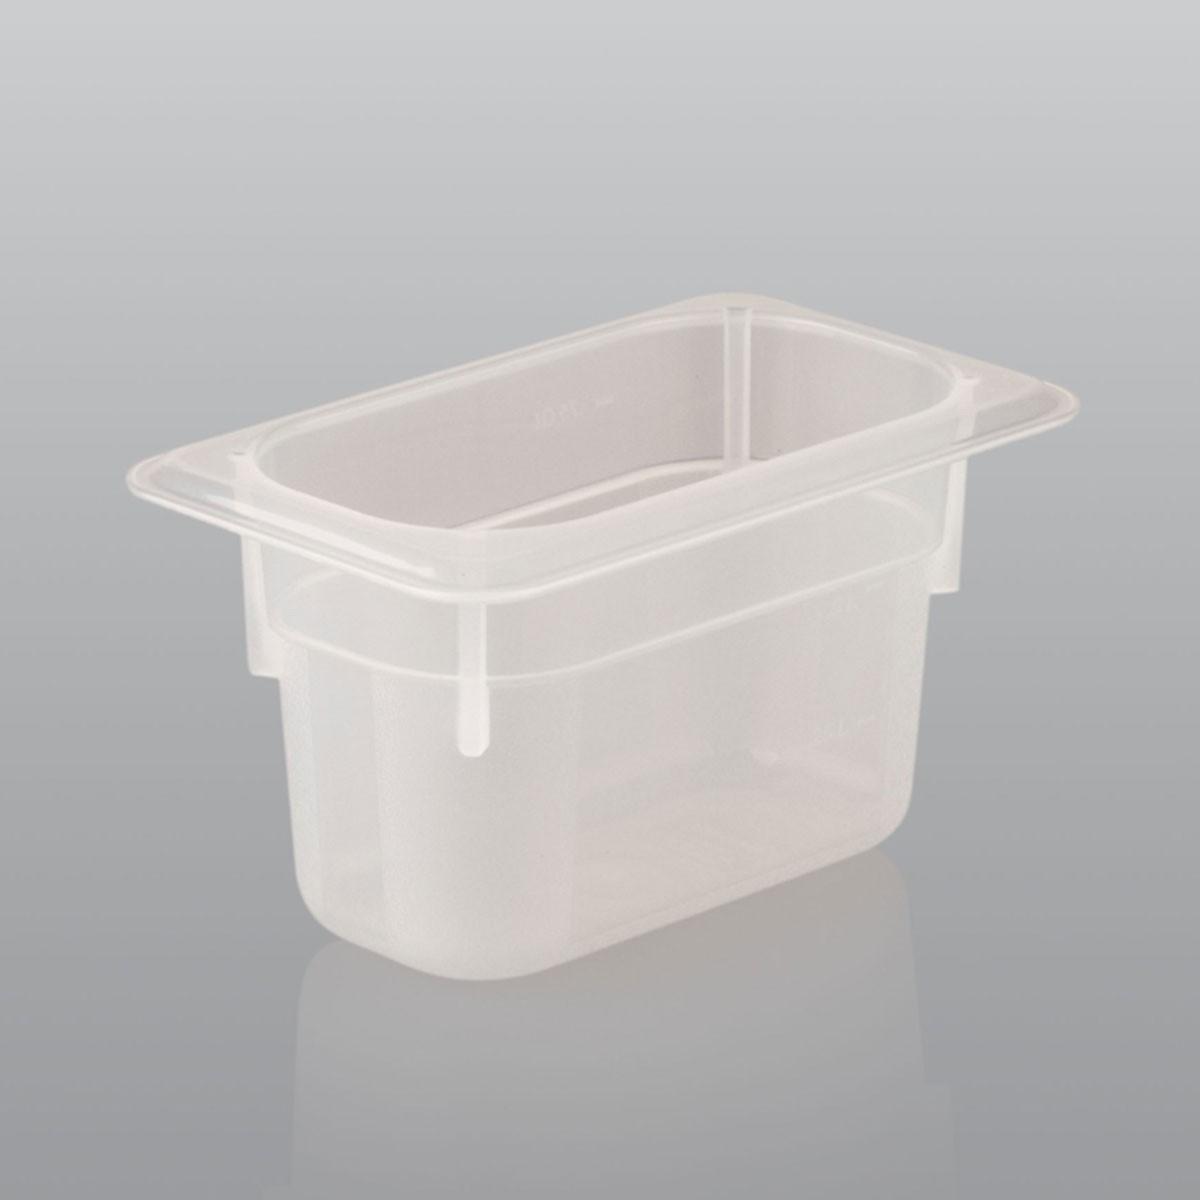 GN-Behälter GN 1/9 aus Polypropylen (Tiefe: 150mm) Saro